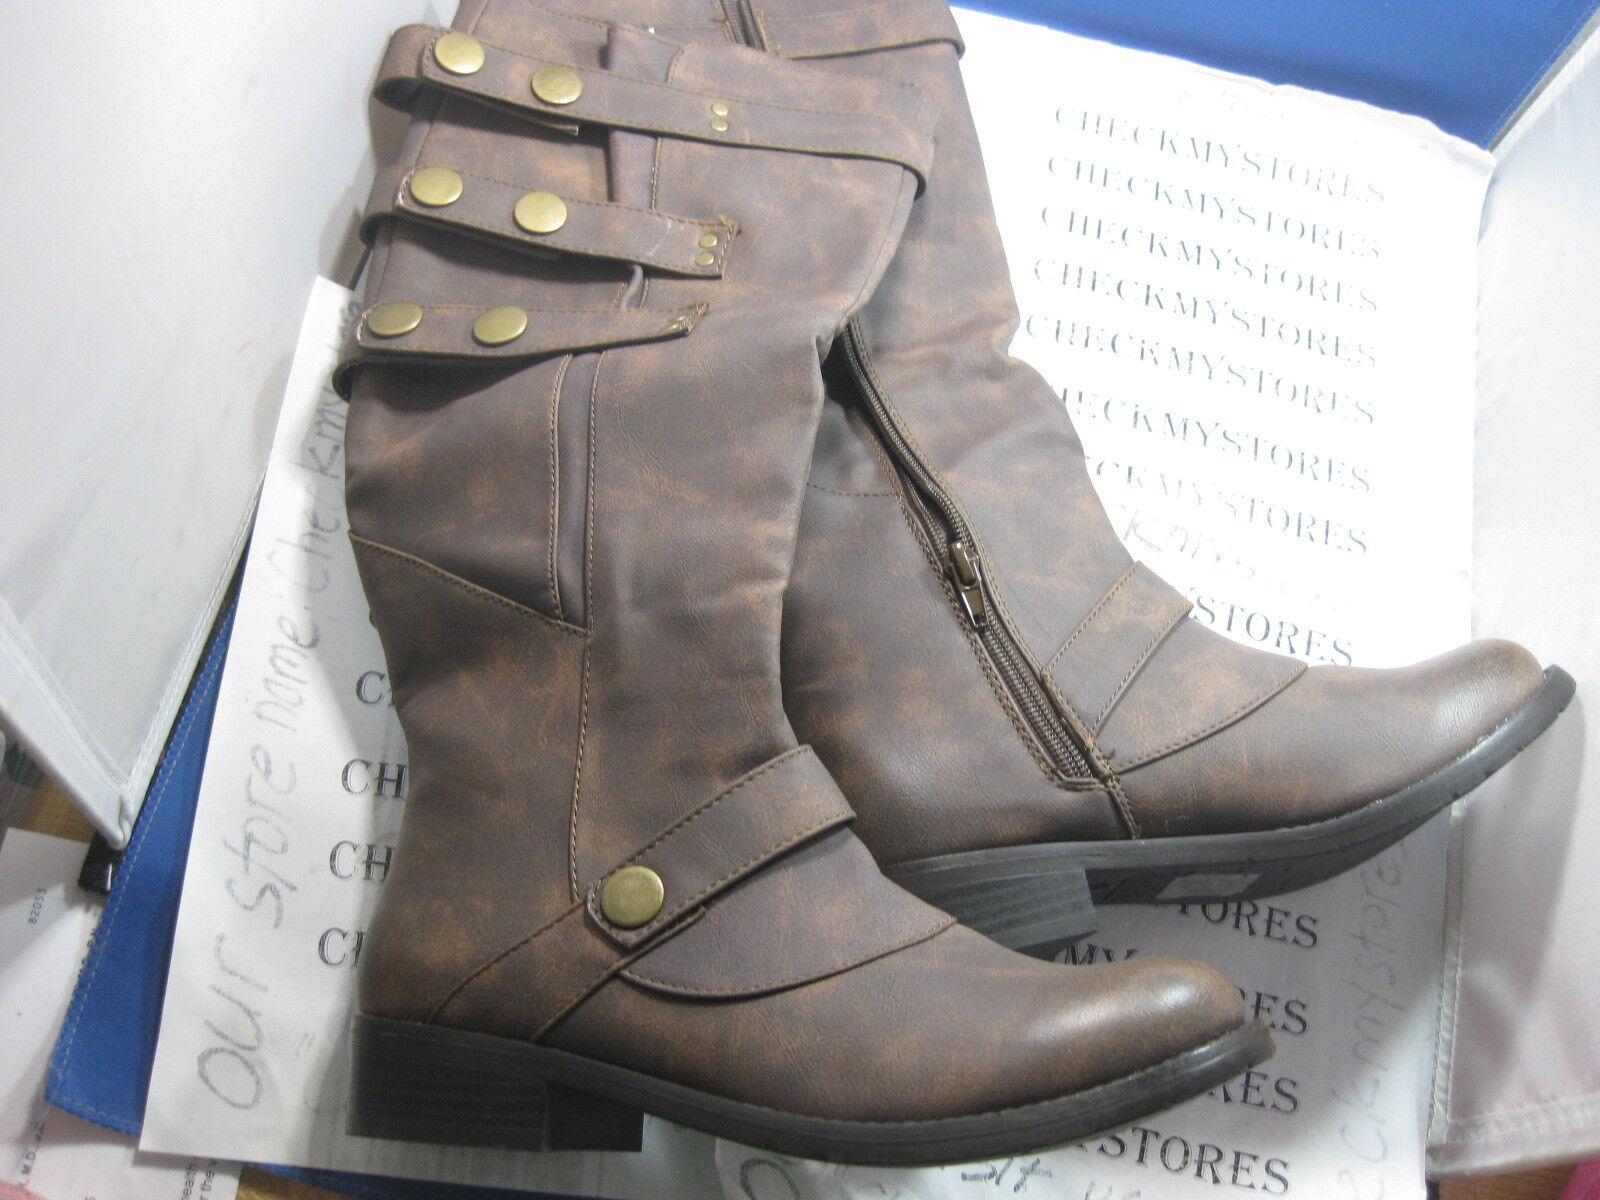 NIB Stylish 2 Lips Too ® Too Jumble premium fashion long boots CHOSE SIZE